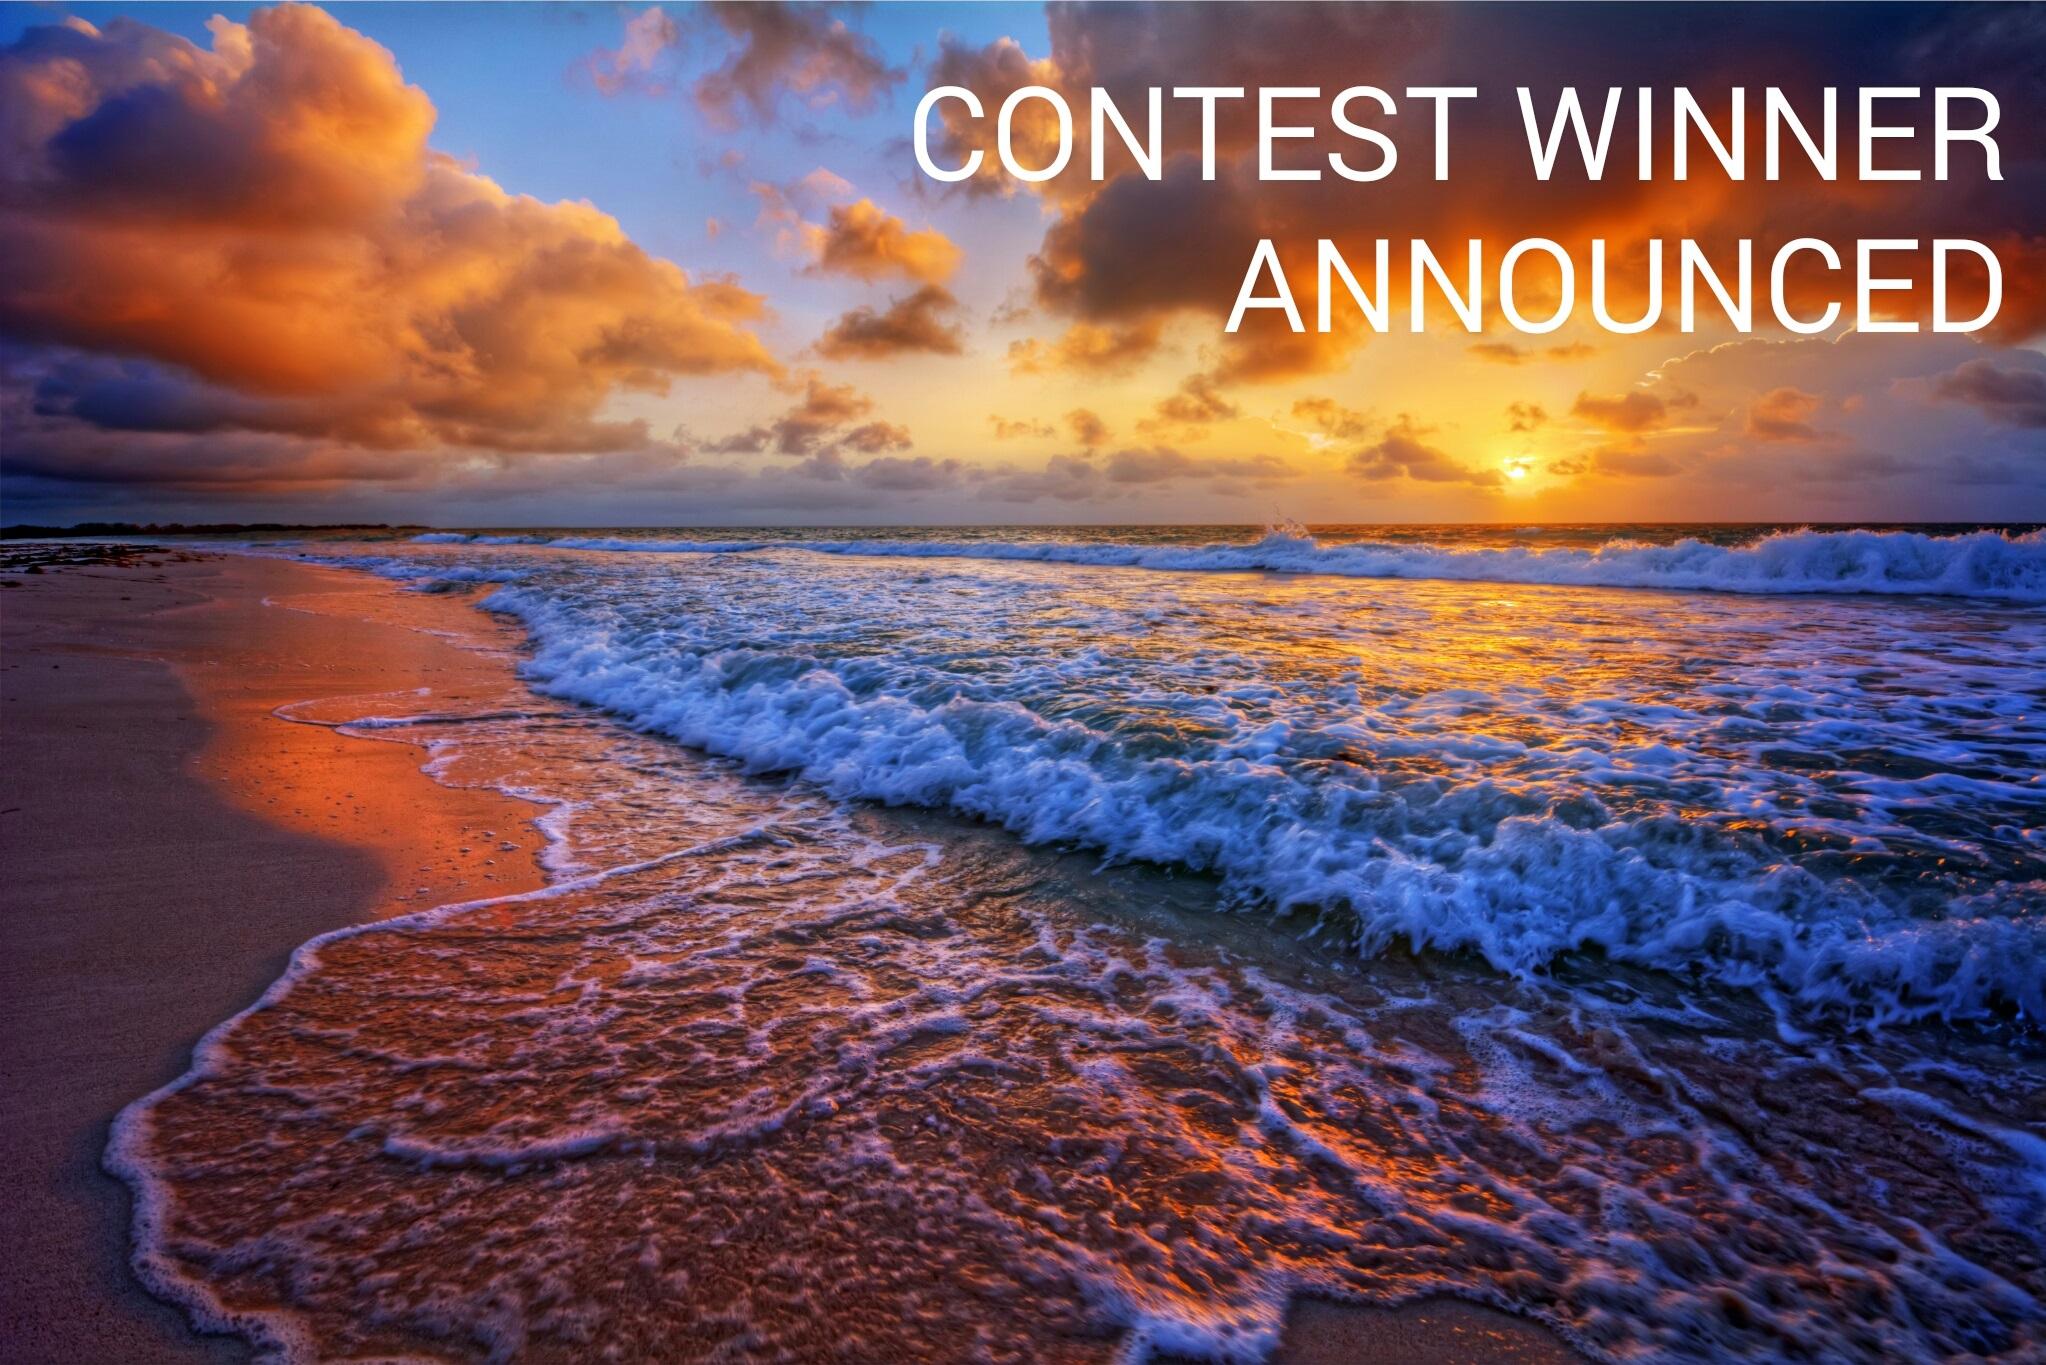 100Klikes Contest Winner Announced